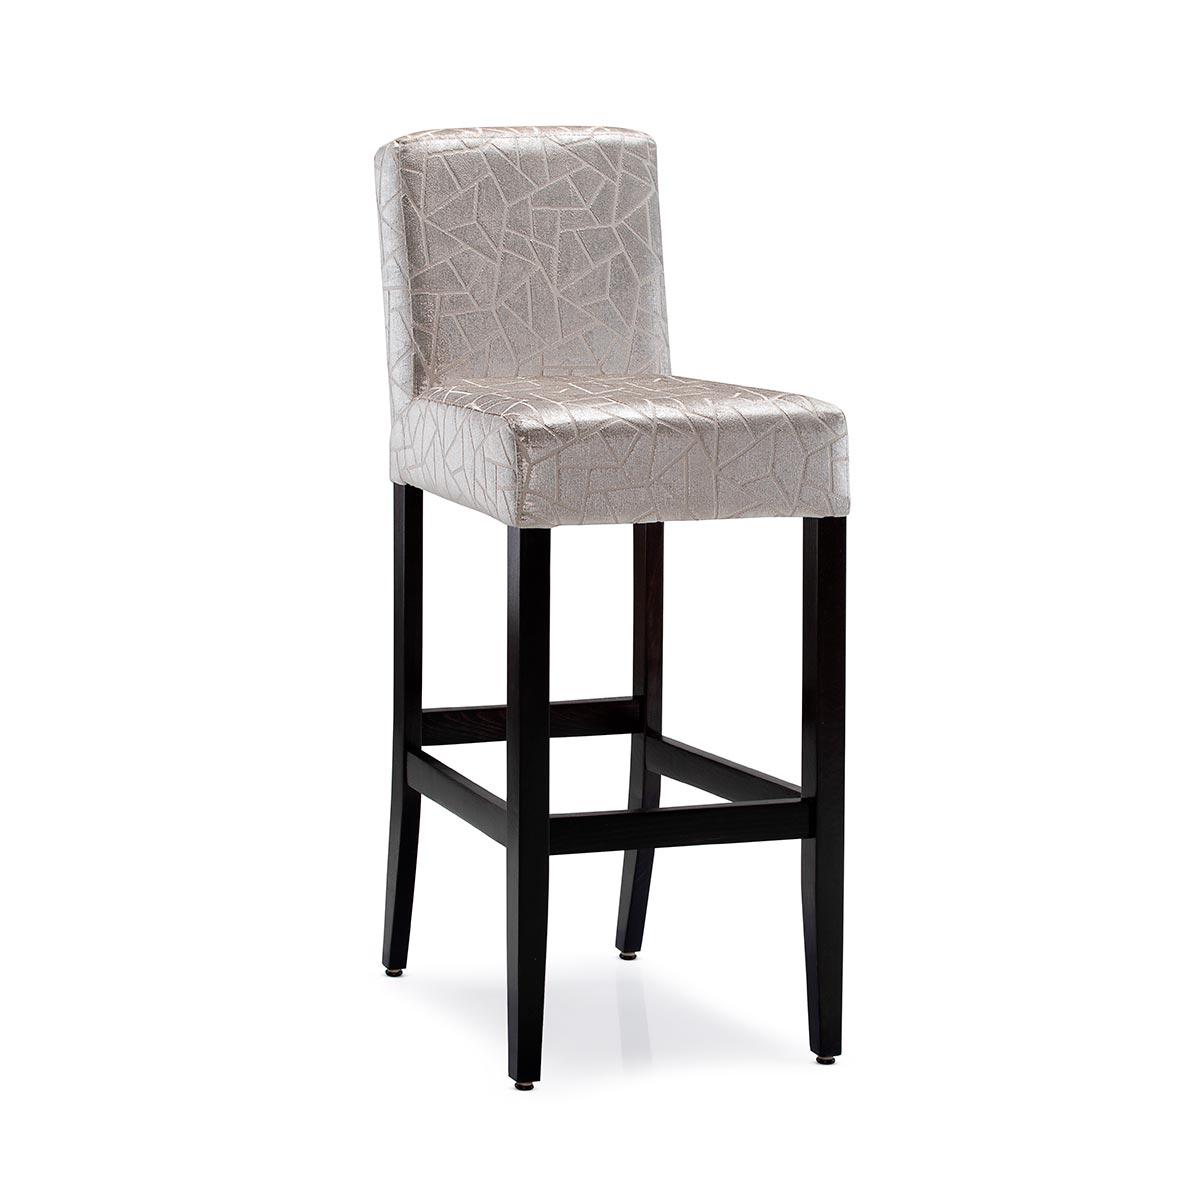 Barska stolica Dex Glad Bar - Detal barske stolice